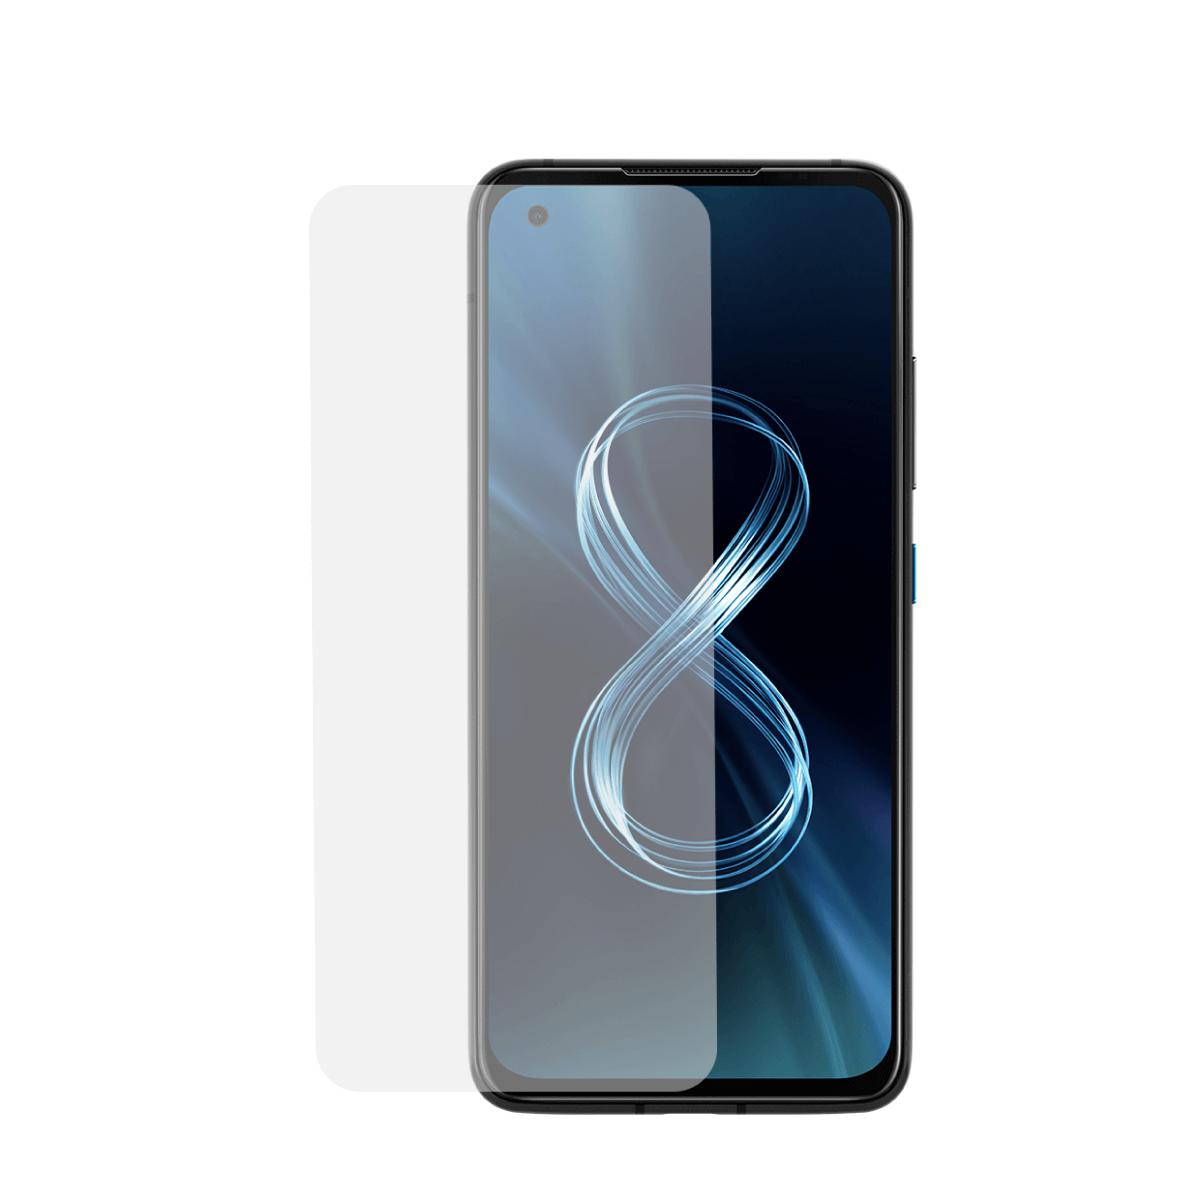 Zenfone 8 玻璃纖維屏幕保護貼